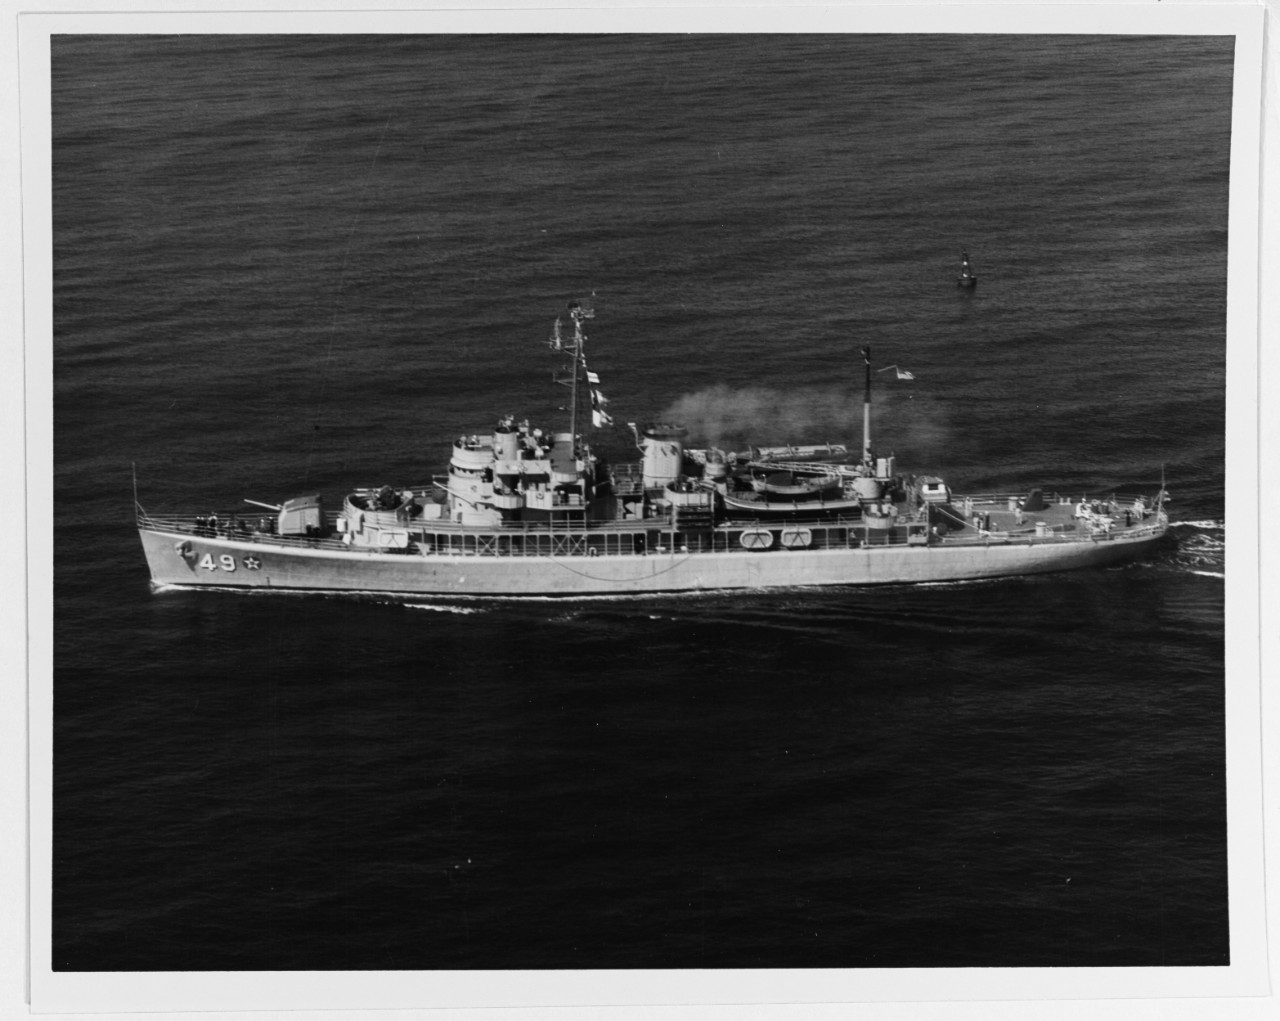 USS Orca AVP-49 NHHC 80-G-668276